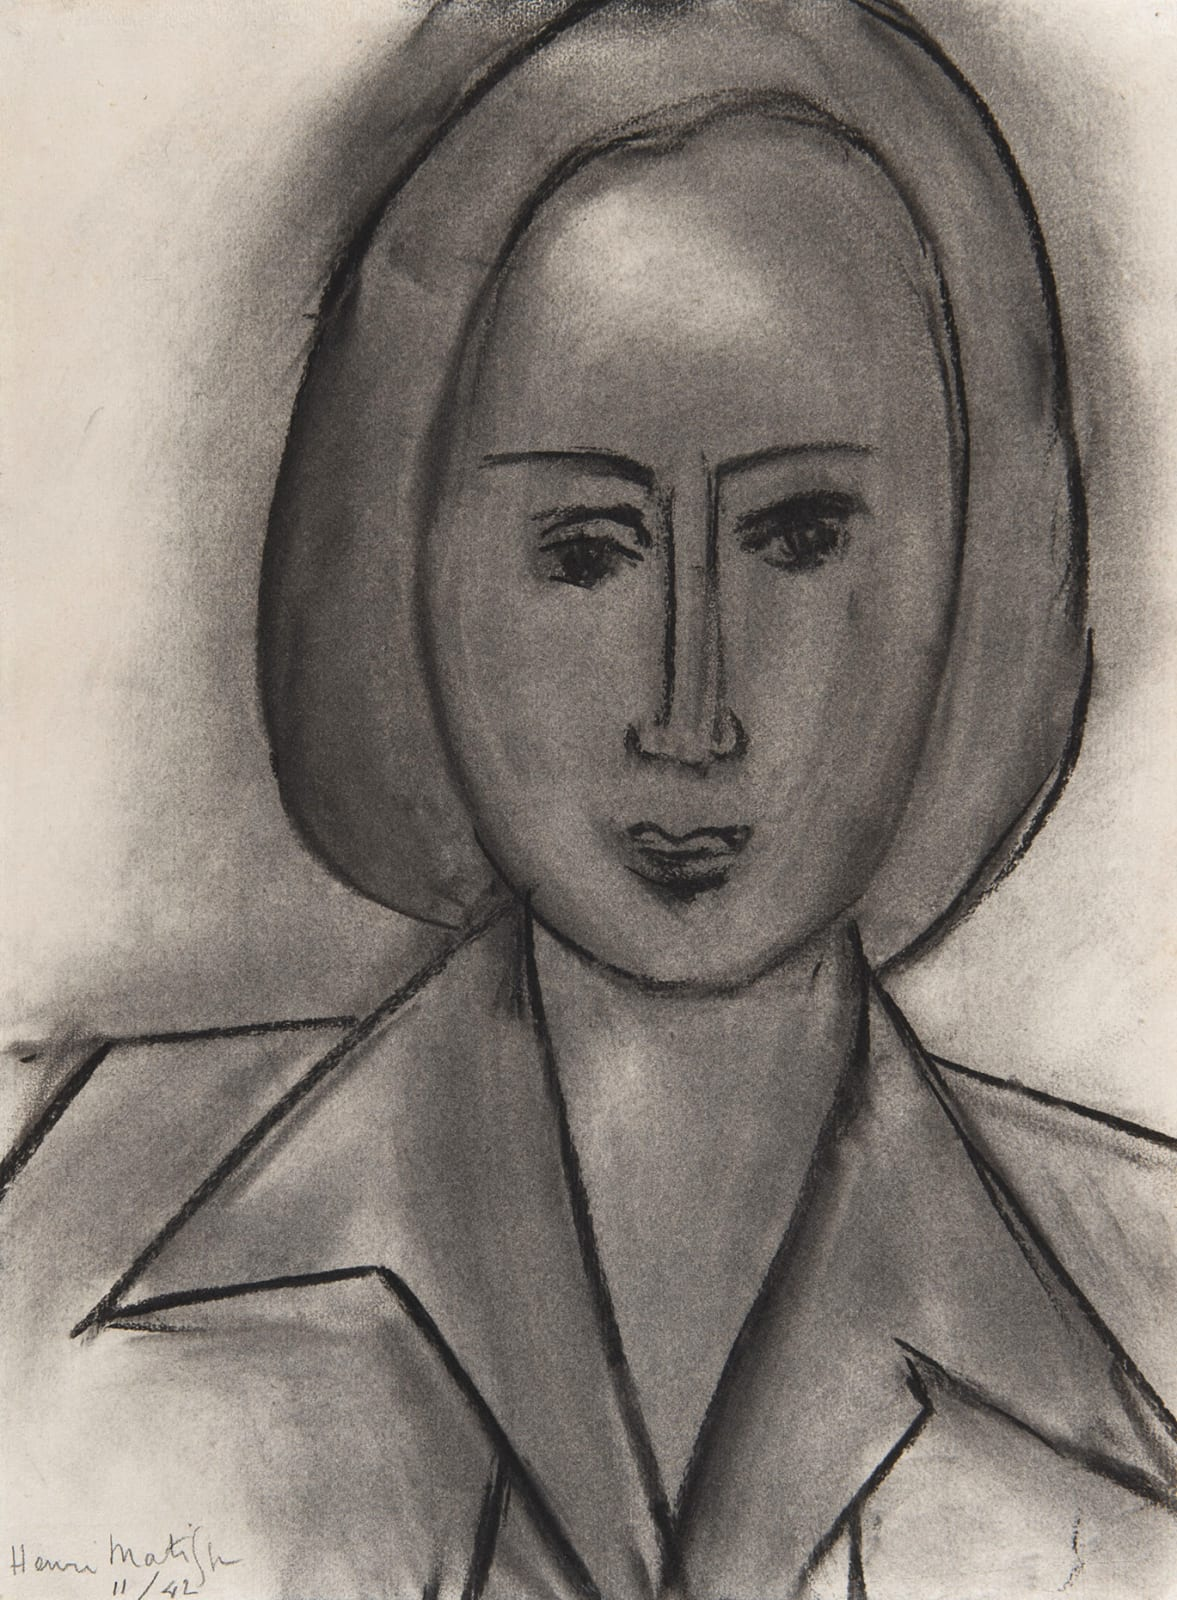 HENRI MATISSE, Monette Vincent, 1942